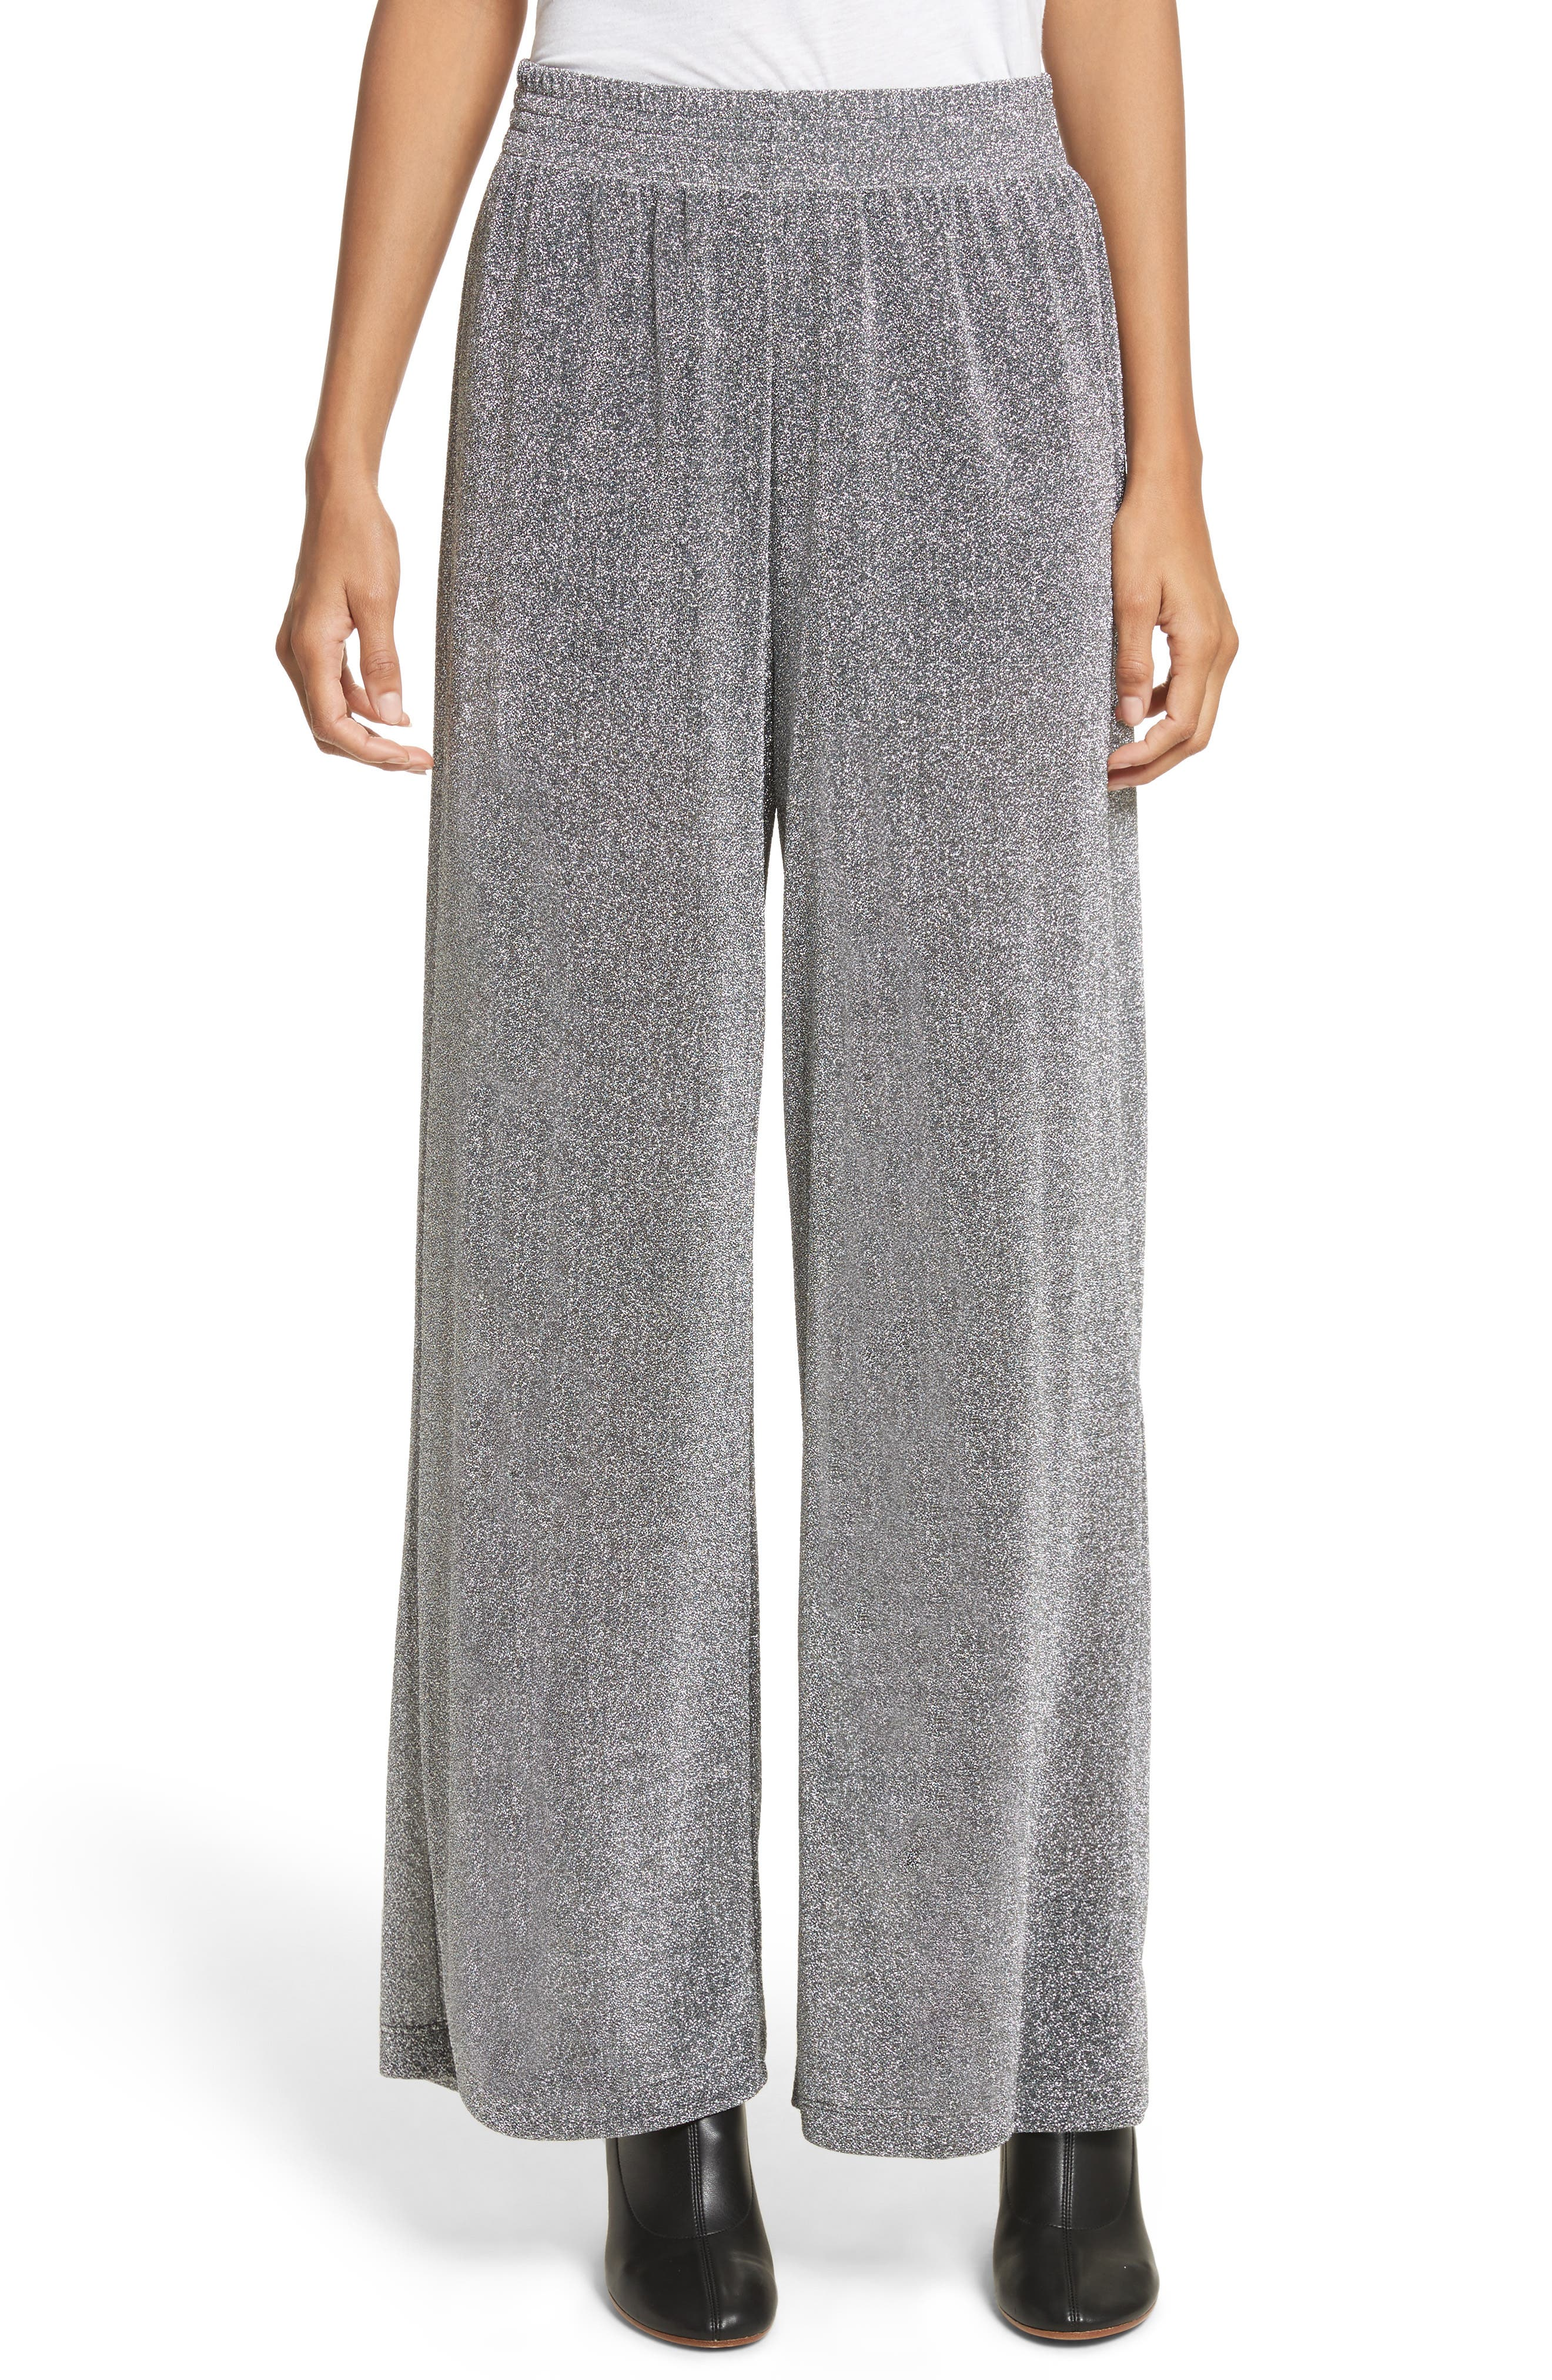 MM6 Maison Margiela Metallic Jersey Wide Leg Pants